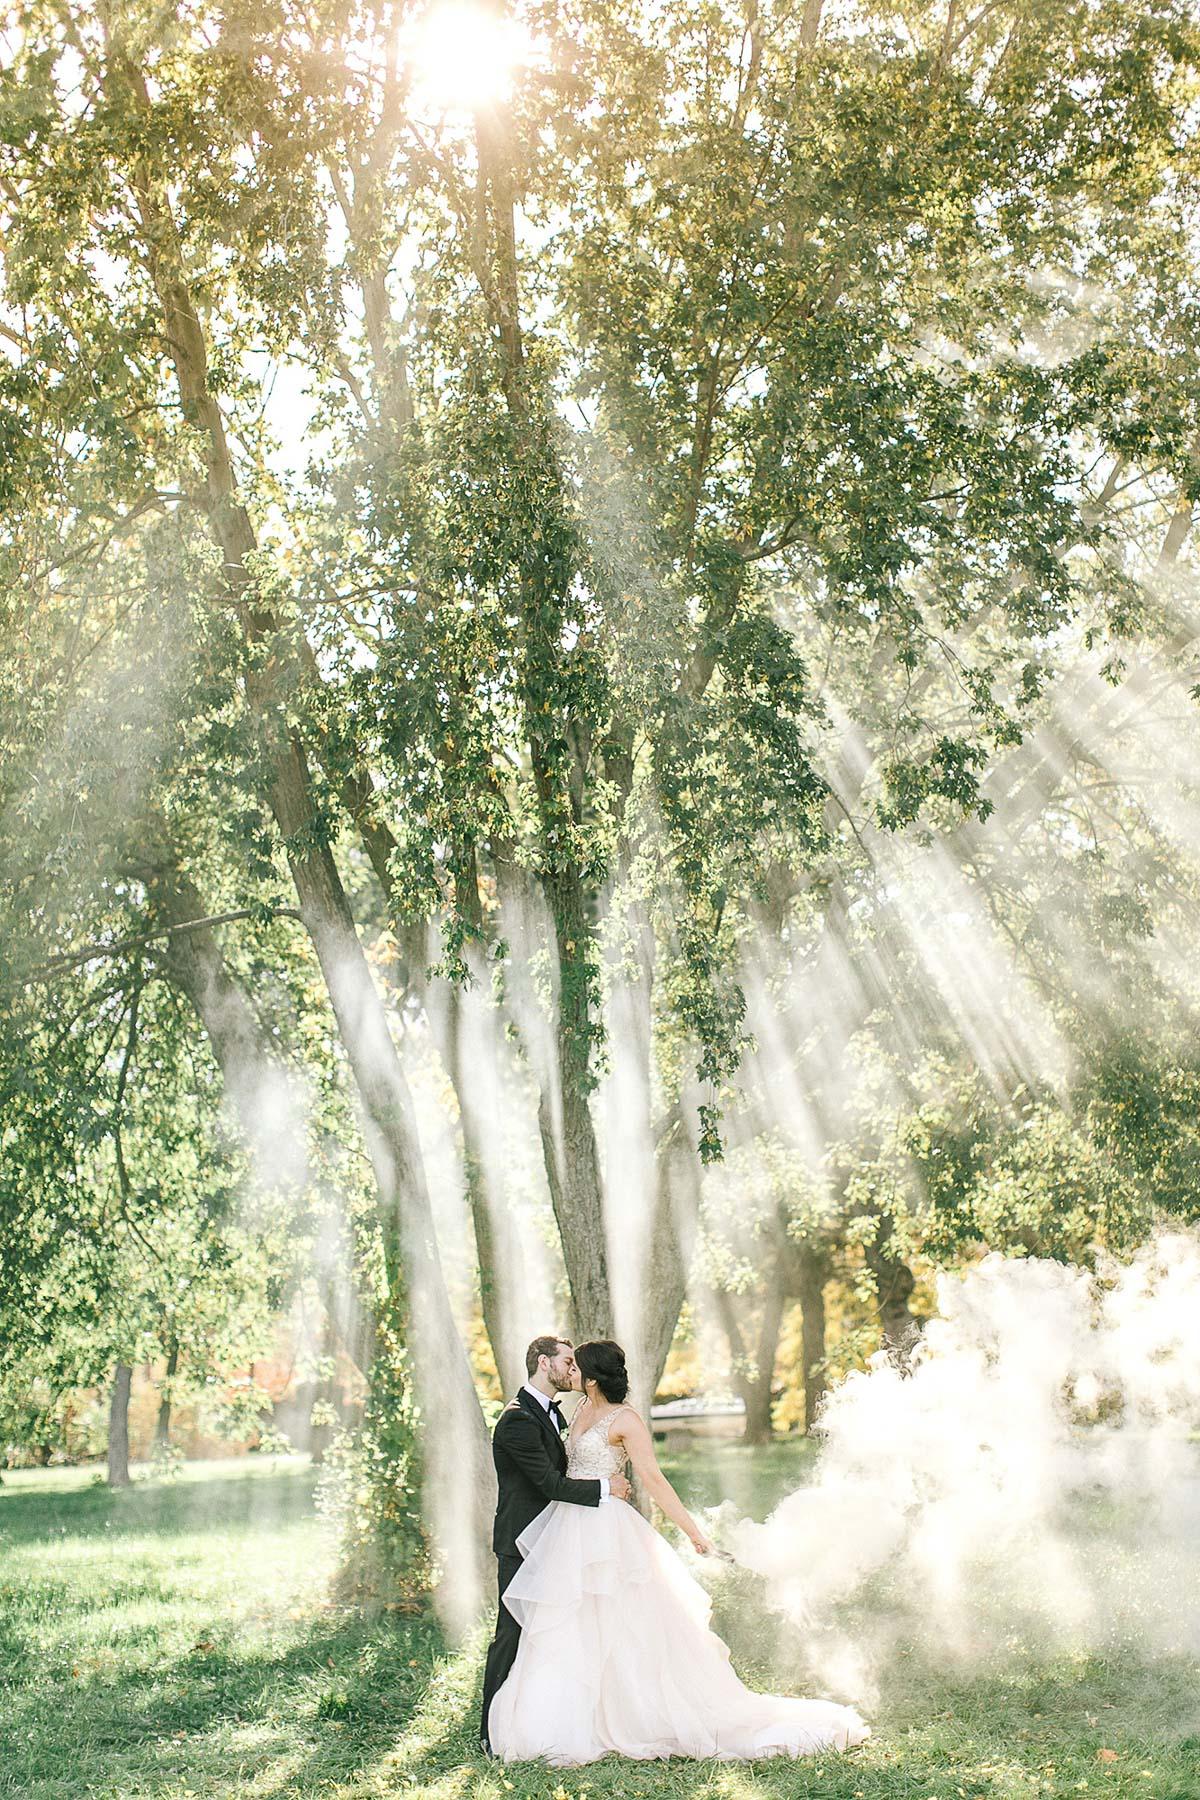 tamara-lockwood-photography-vineyard-bride-swish-list-the-old-courthouse-niagara-on-the-lake-wedding-42.jpg